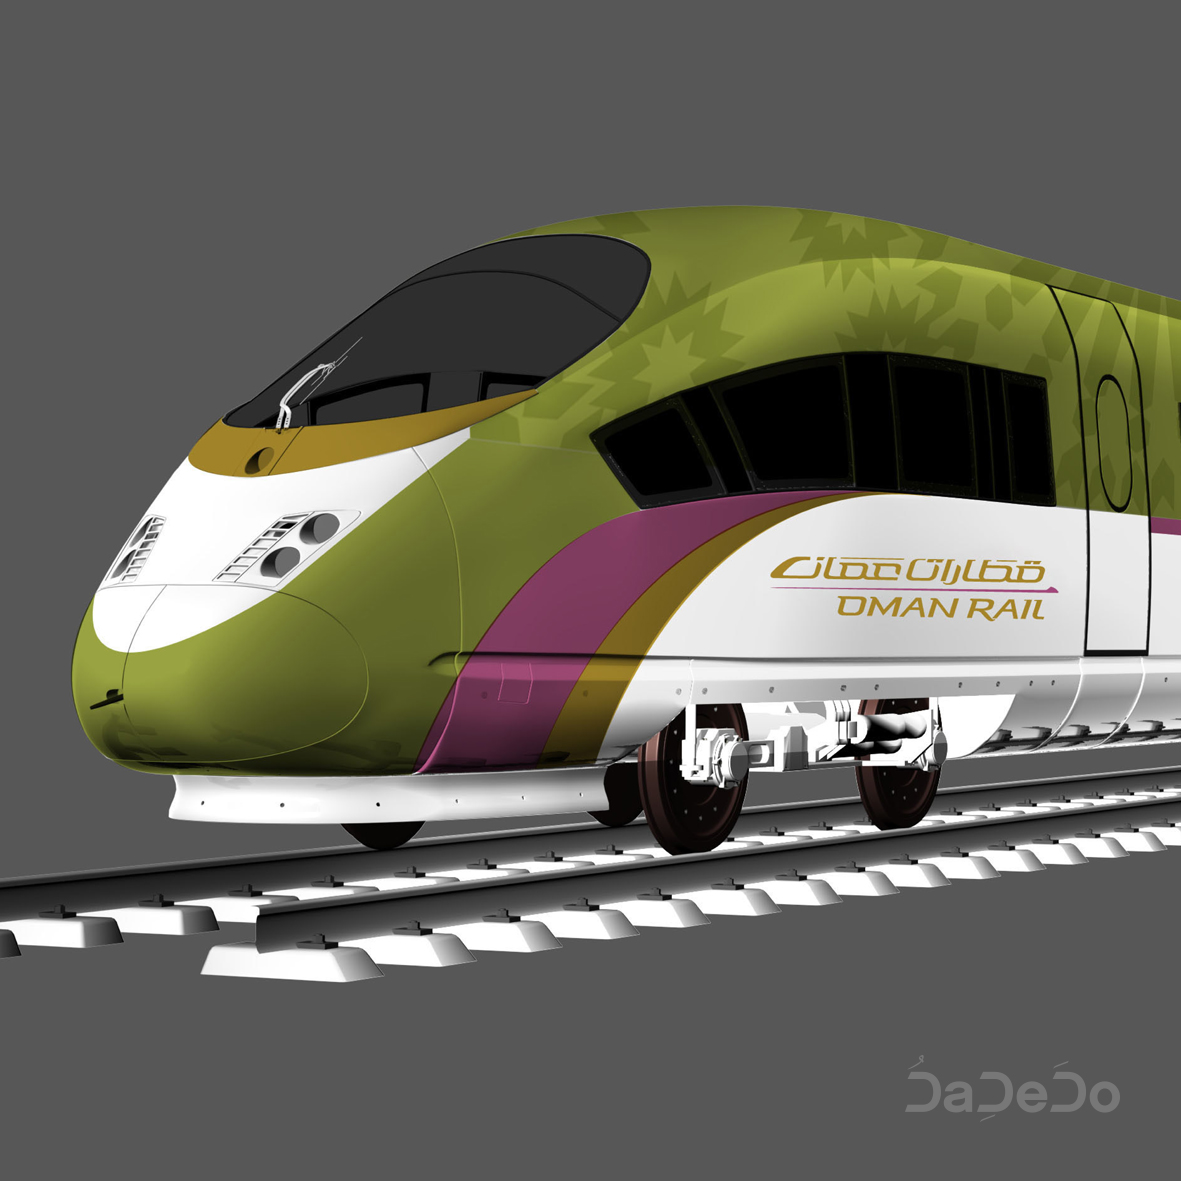 Oman Rail Branding & Design